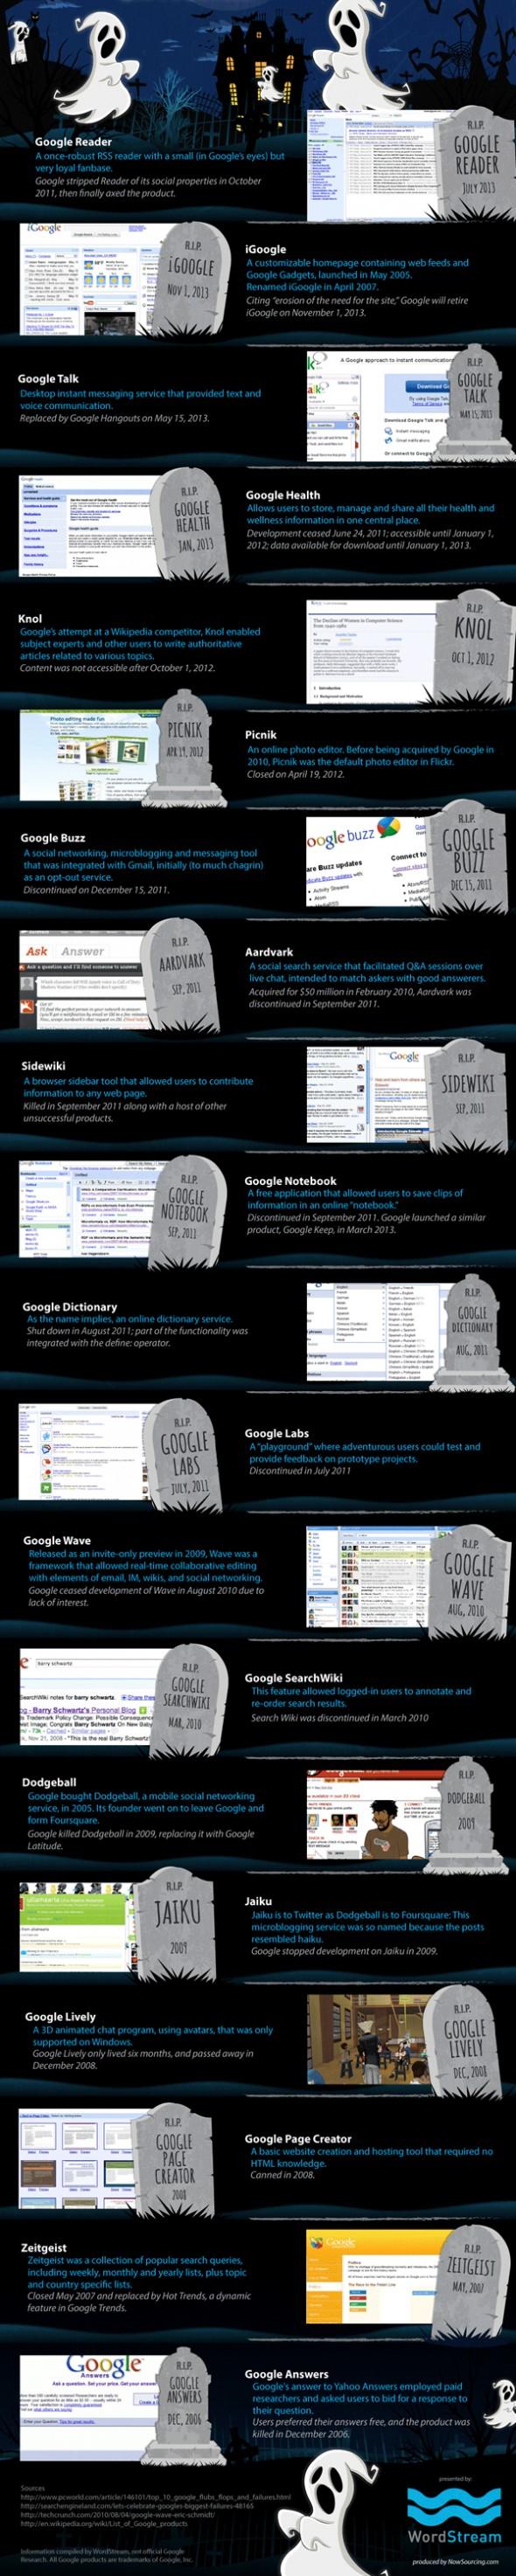 google-graveyard-2